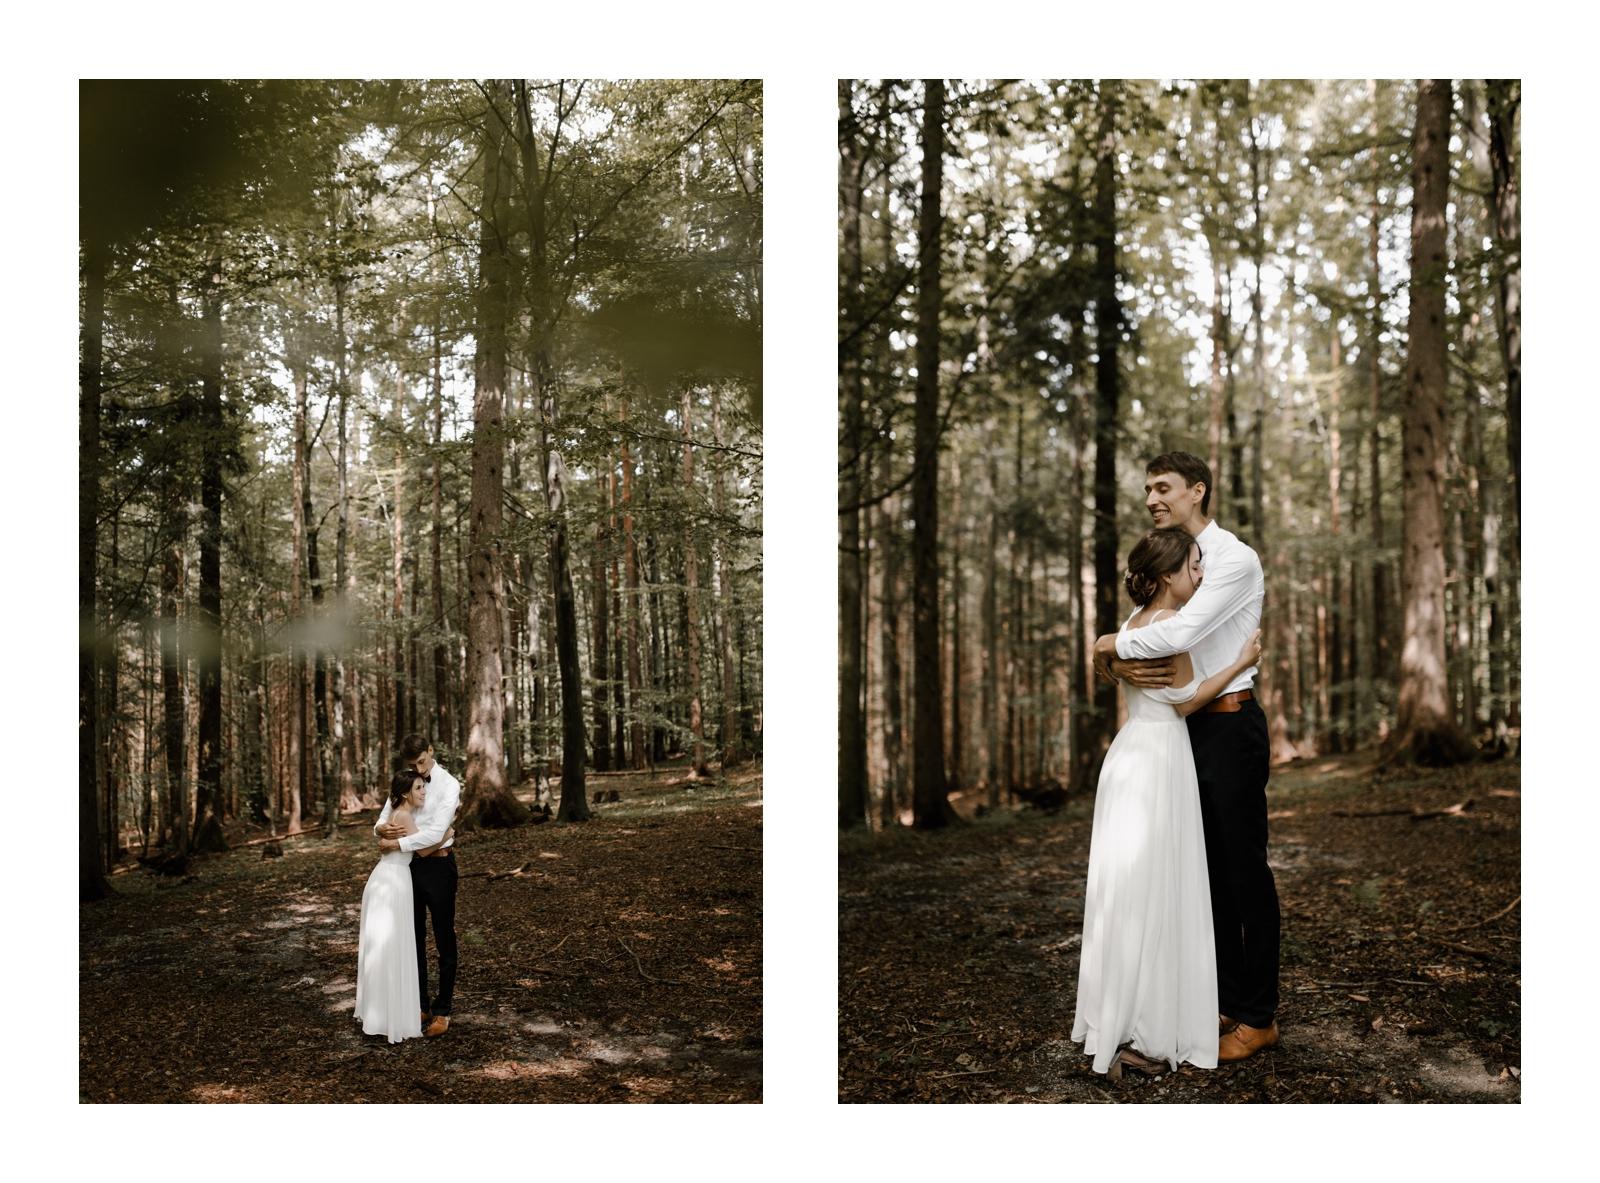 mirjam_thomas_wedding-273.jpg